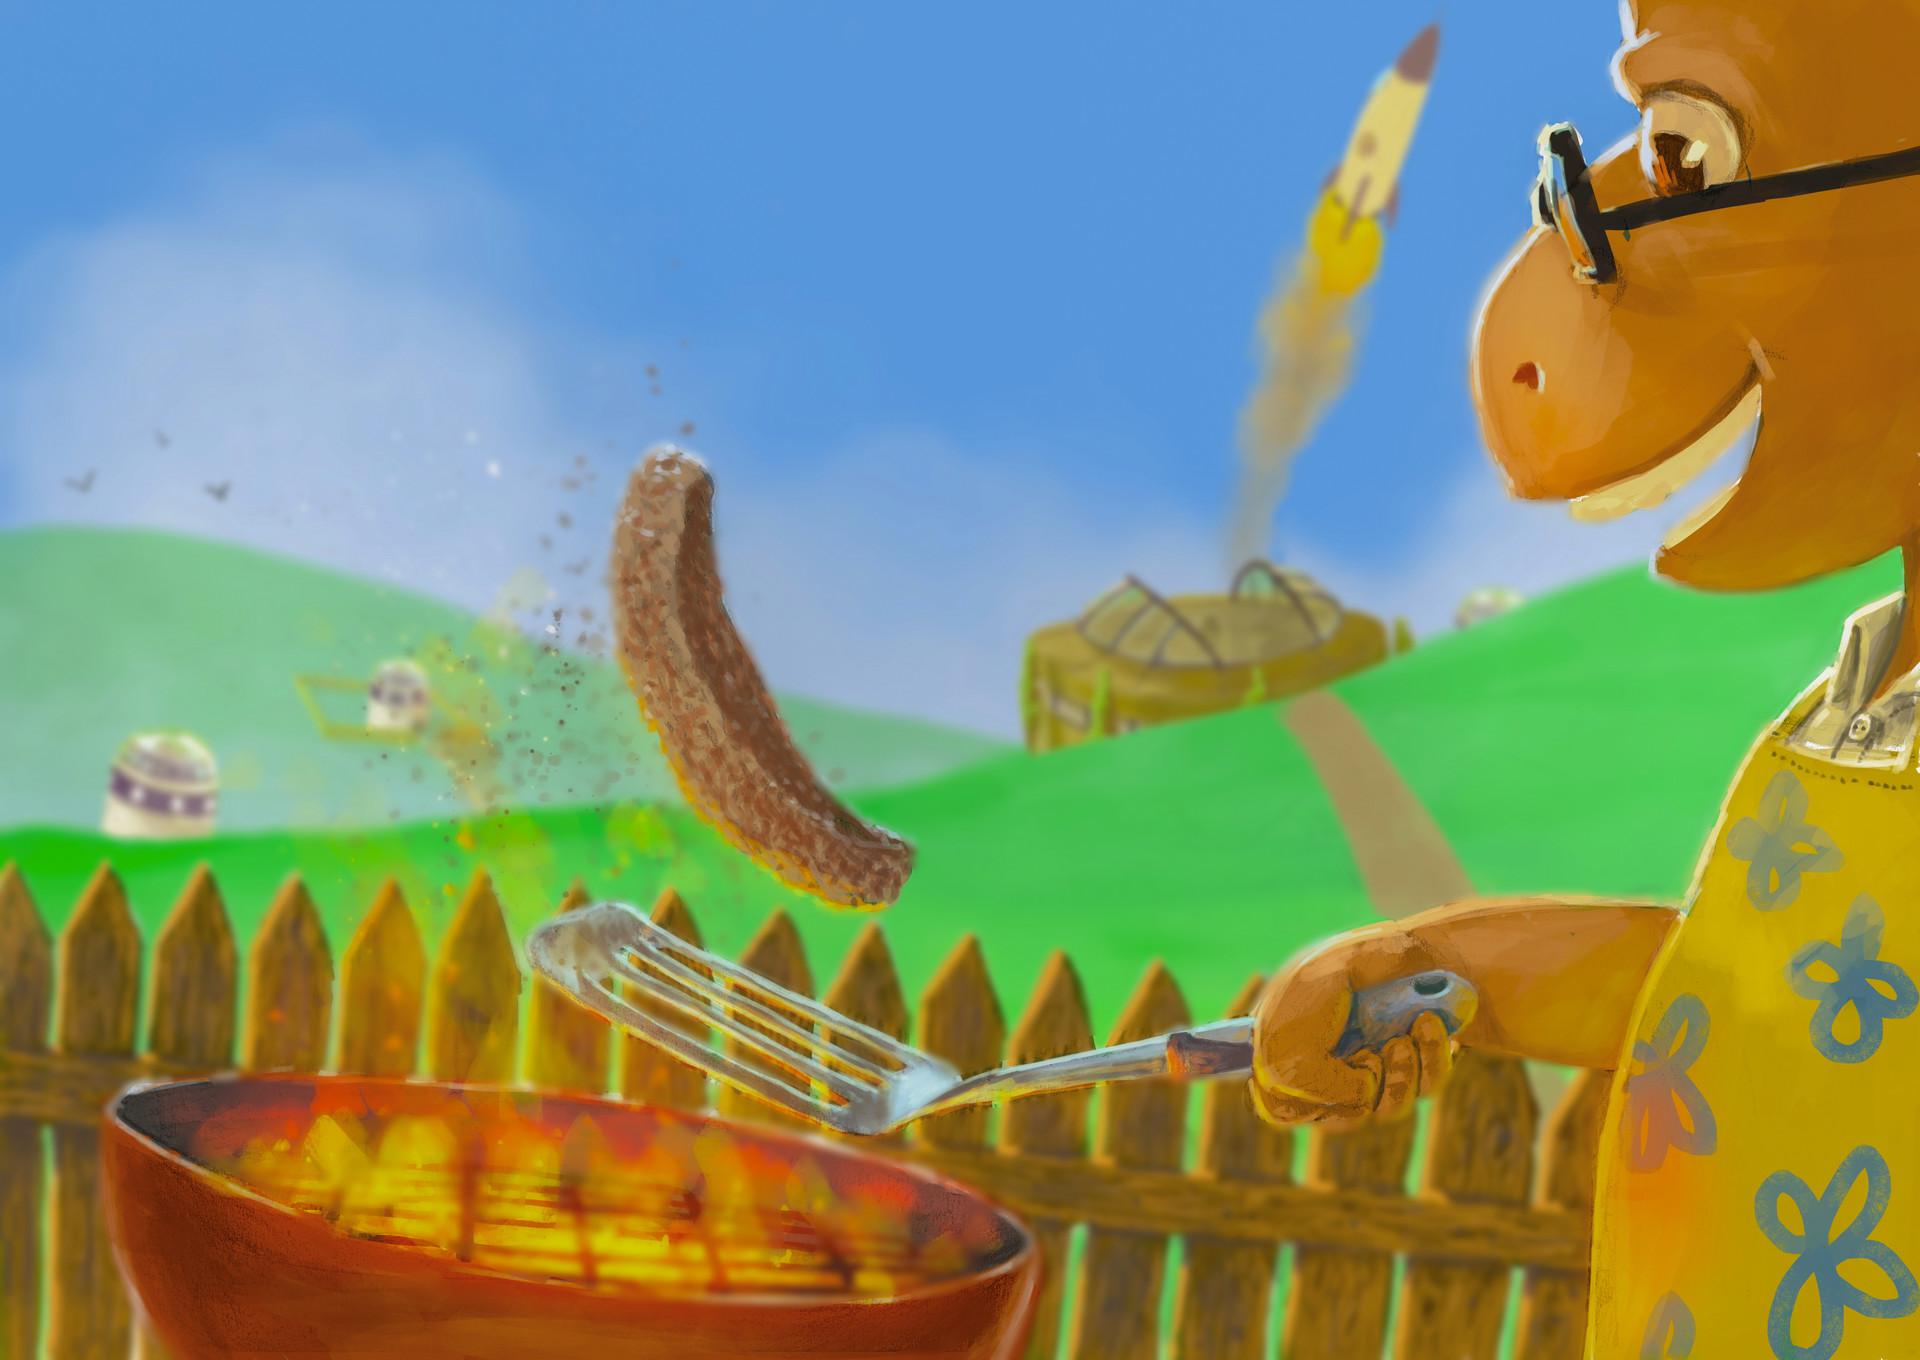 Lizartonne dani rodriguez palacios curiosaurios 2